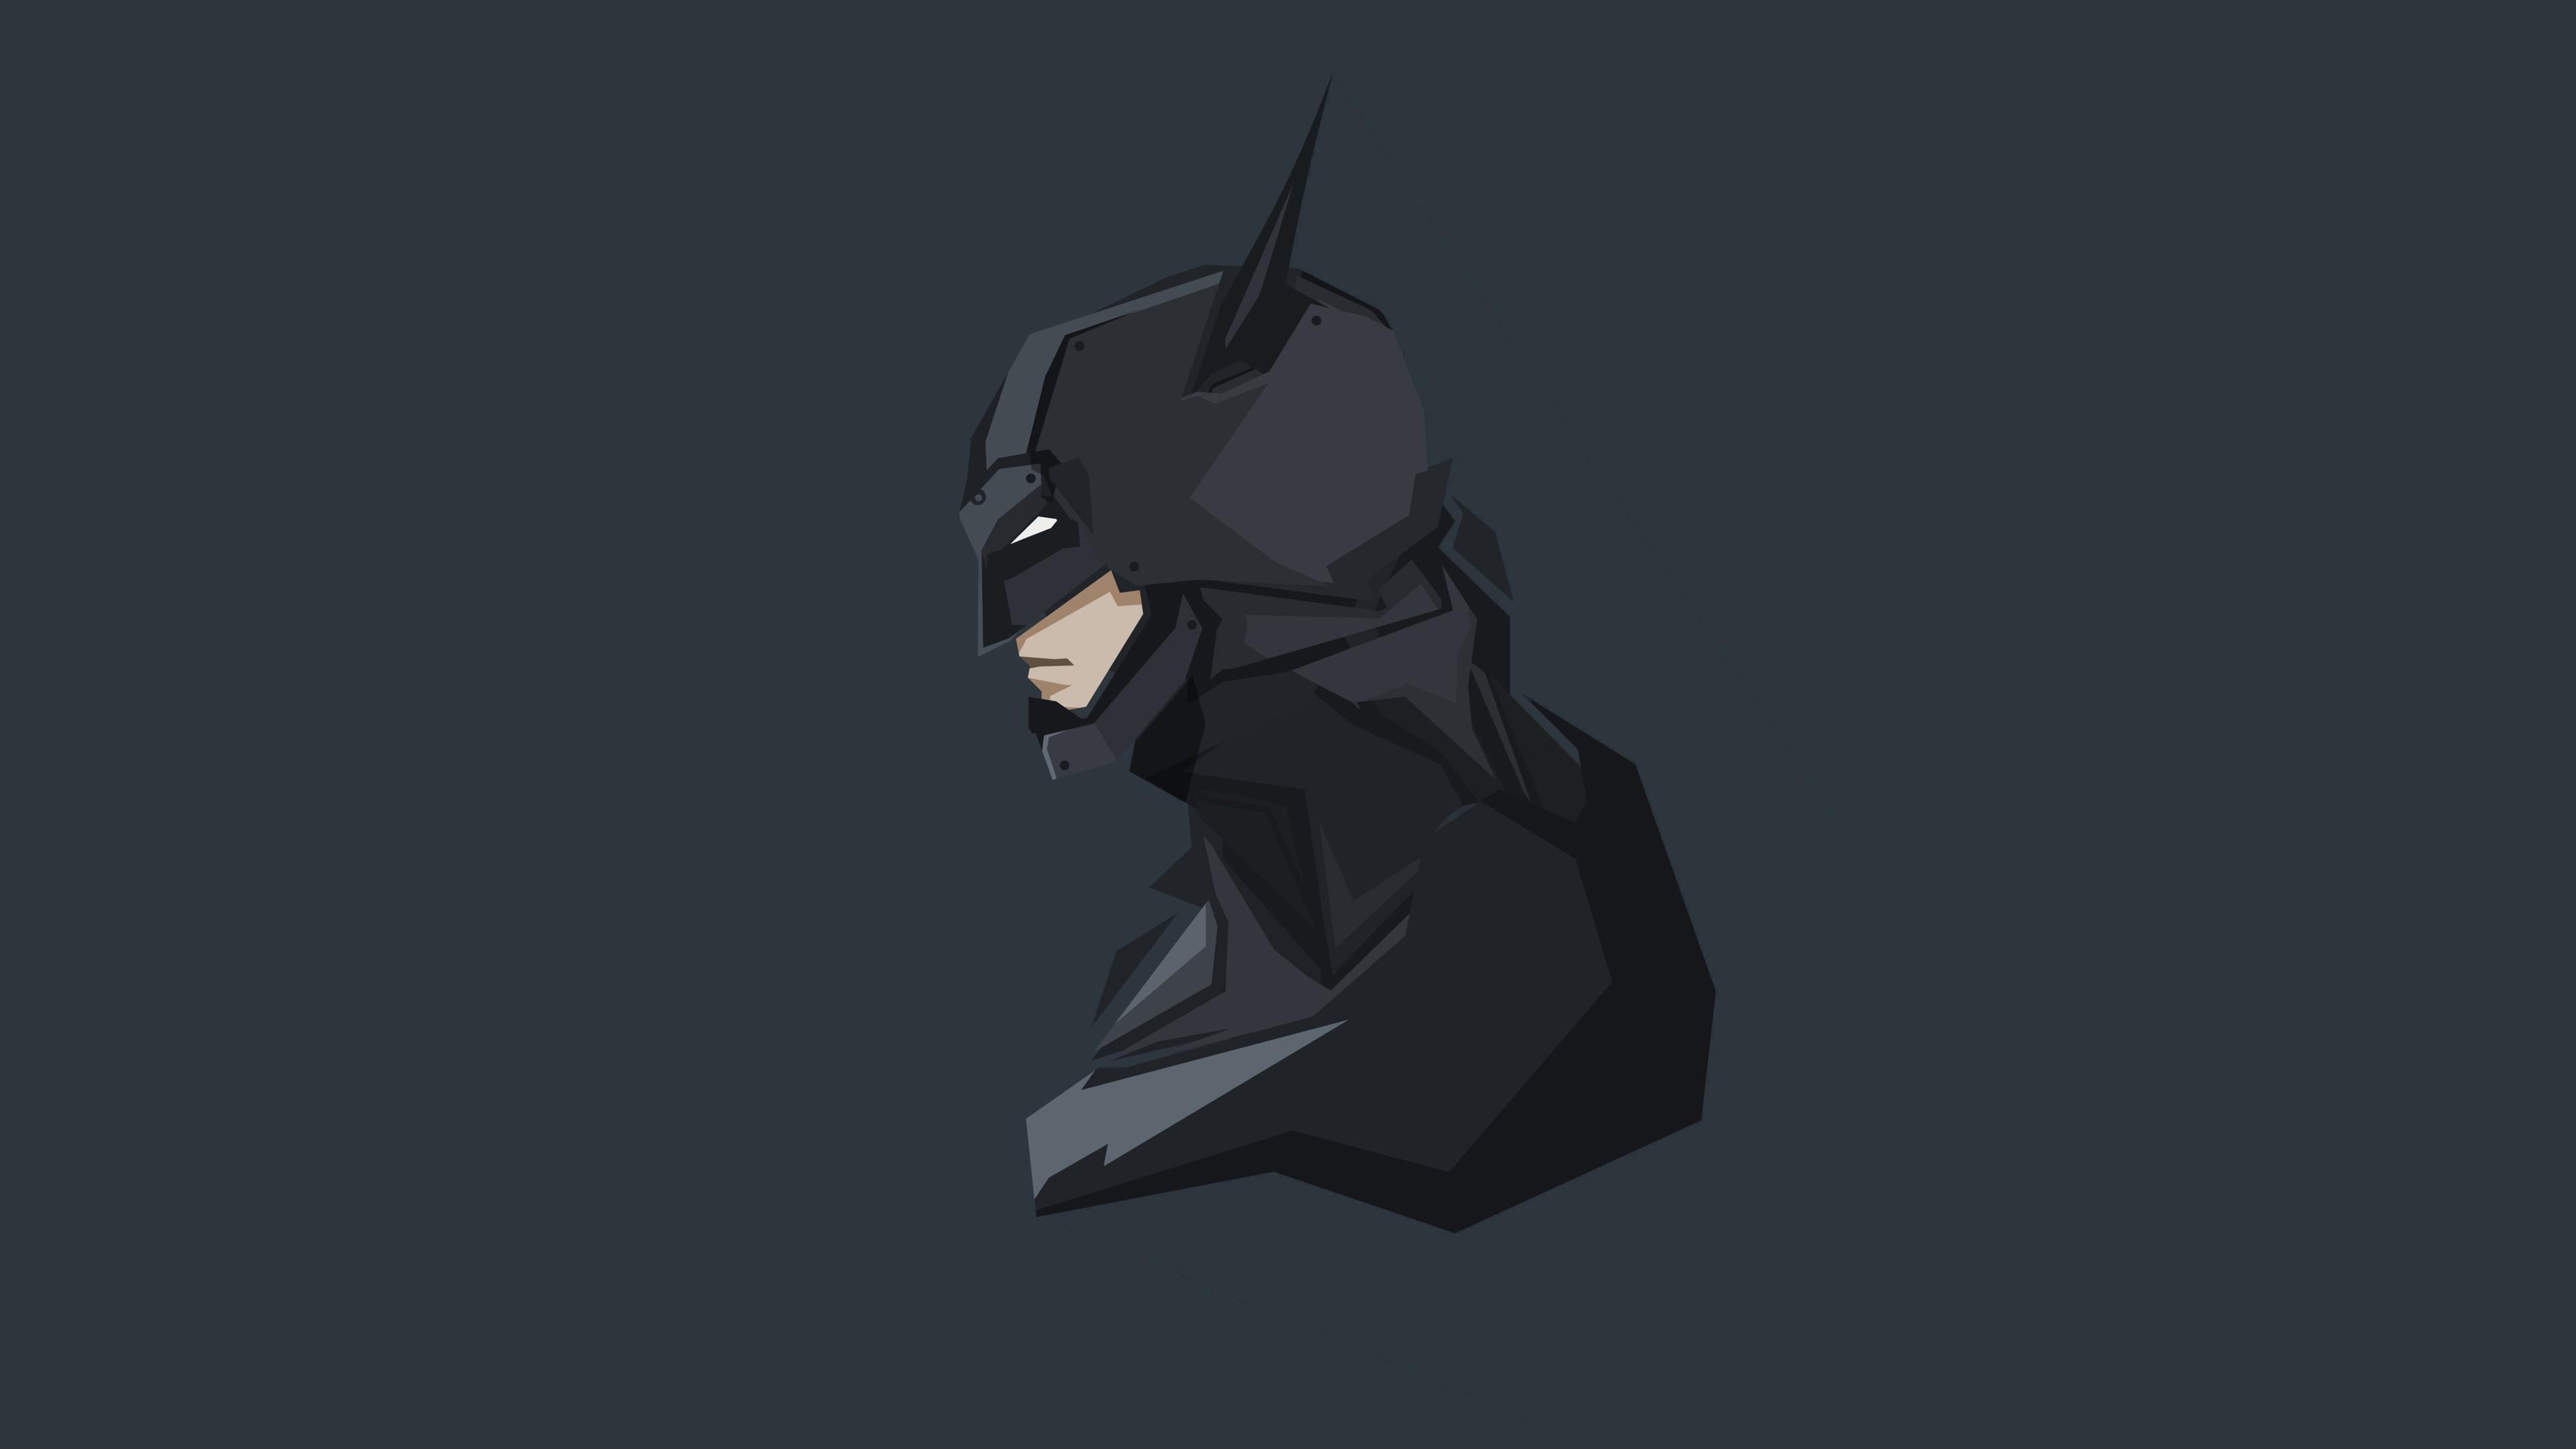 batman 4k minimal 1536523575 - Batman 4k Minimal - superheroes wallpapers, minimalism wallpapers, hd-wallpapers, batman.artwork wallpapers, artstation wallpapers, artist wallpapers, 4k-wallpapers